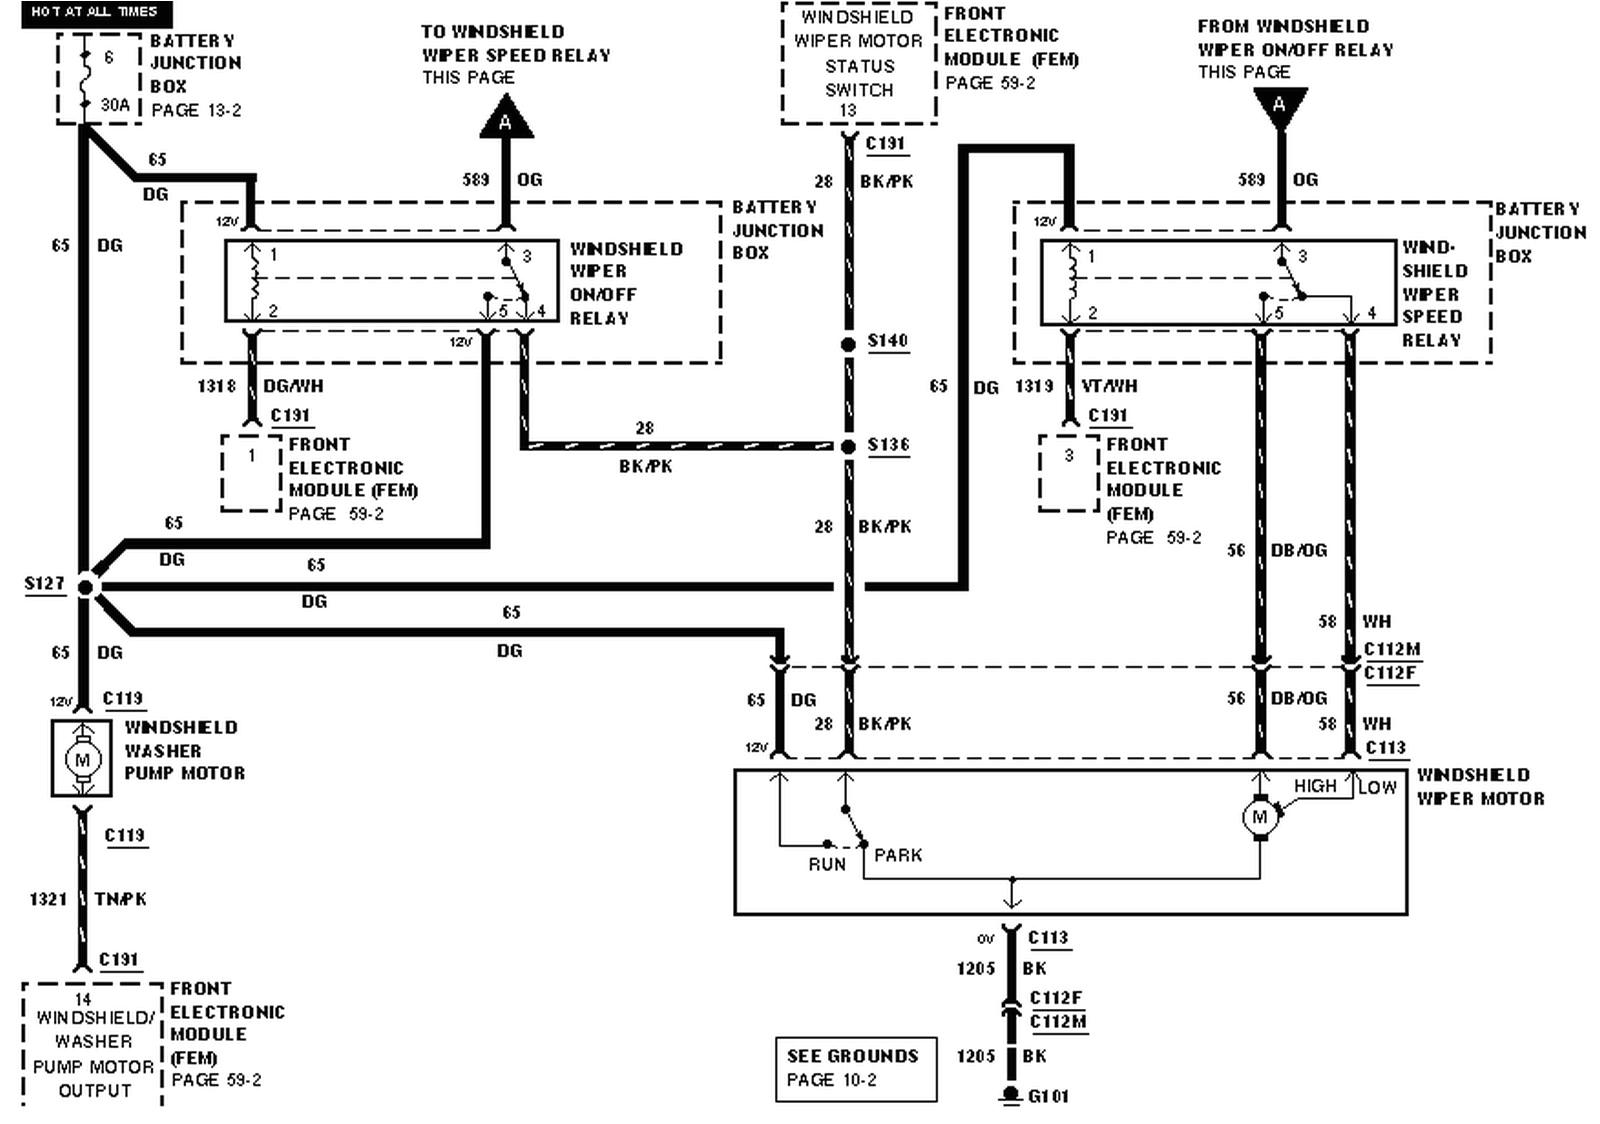 windstar wiring diagram wiring diagram week2000 ford windstar wiring diagram wiring diagrams konsult 96 windstar wiring